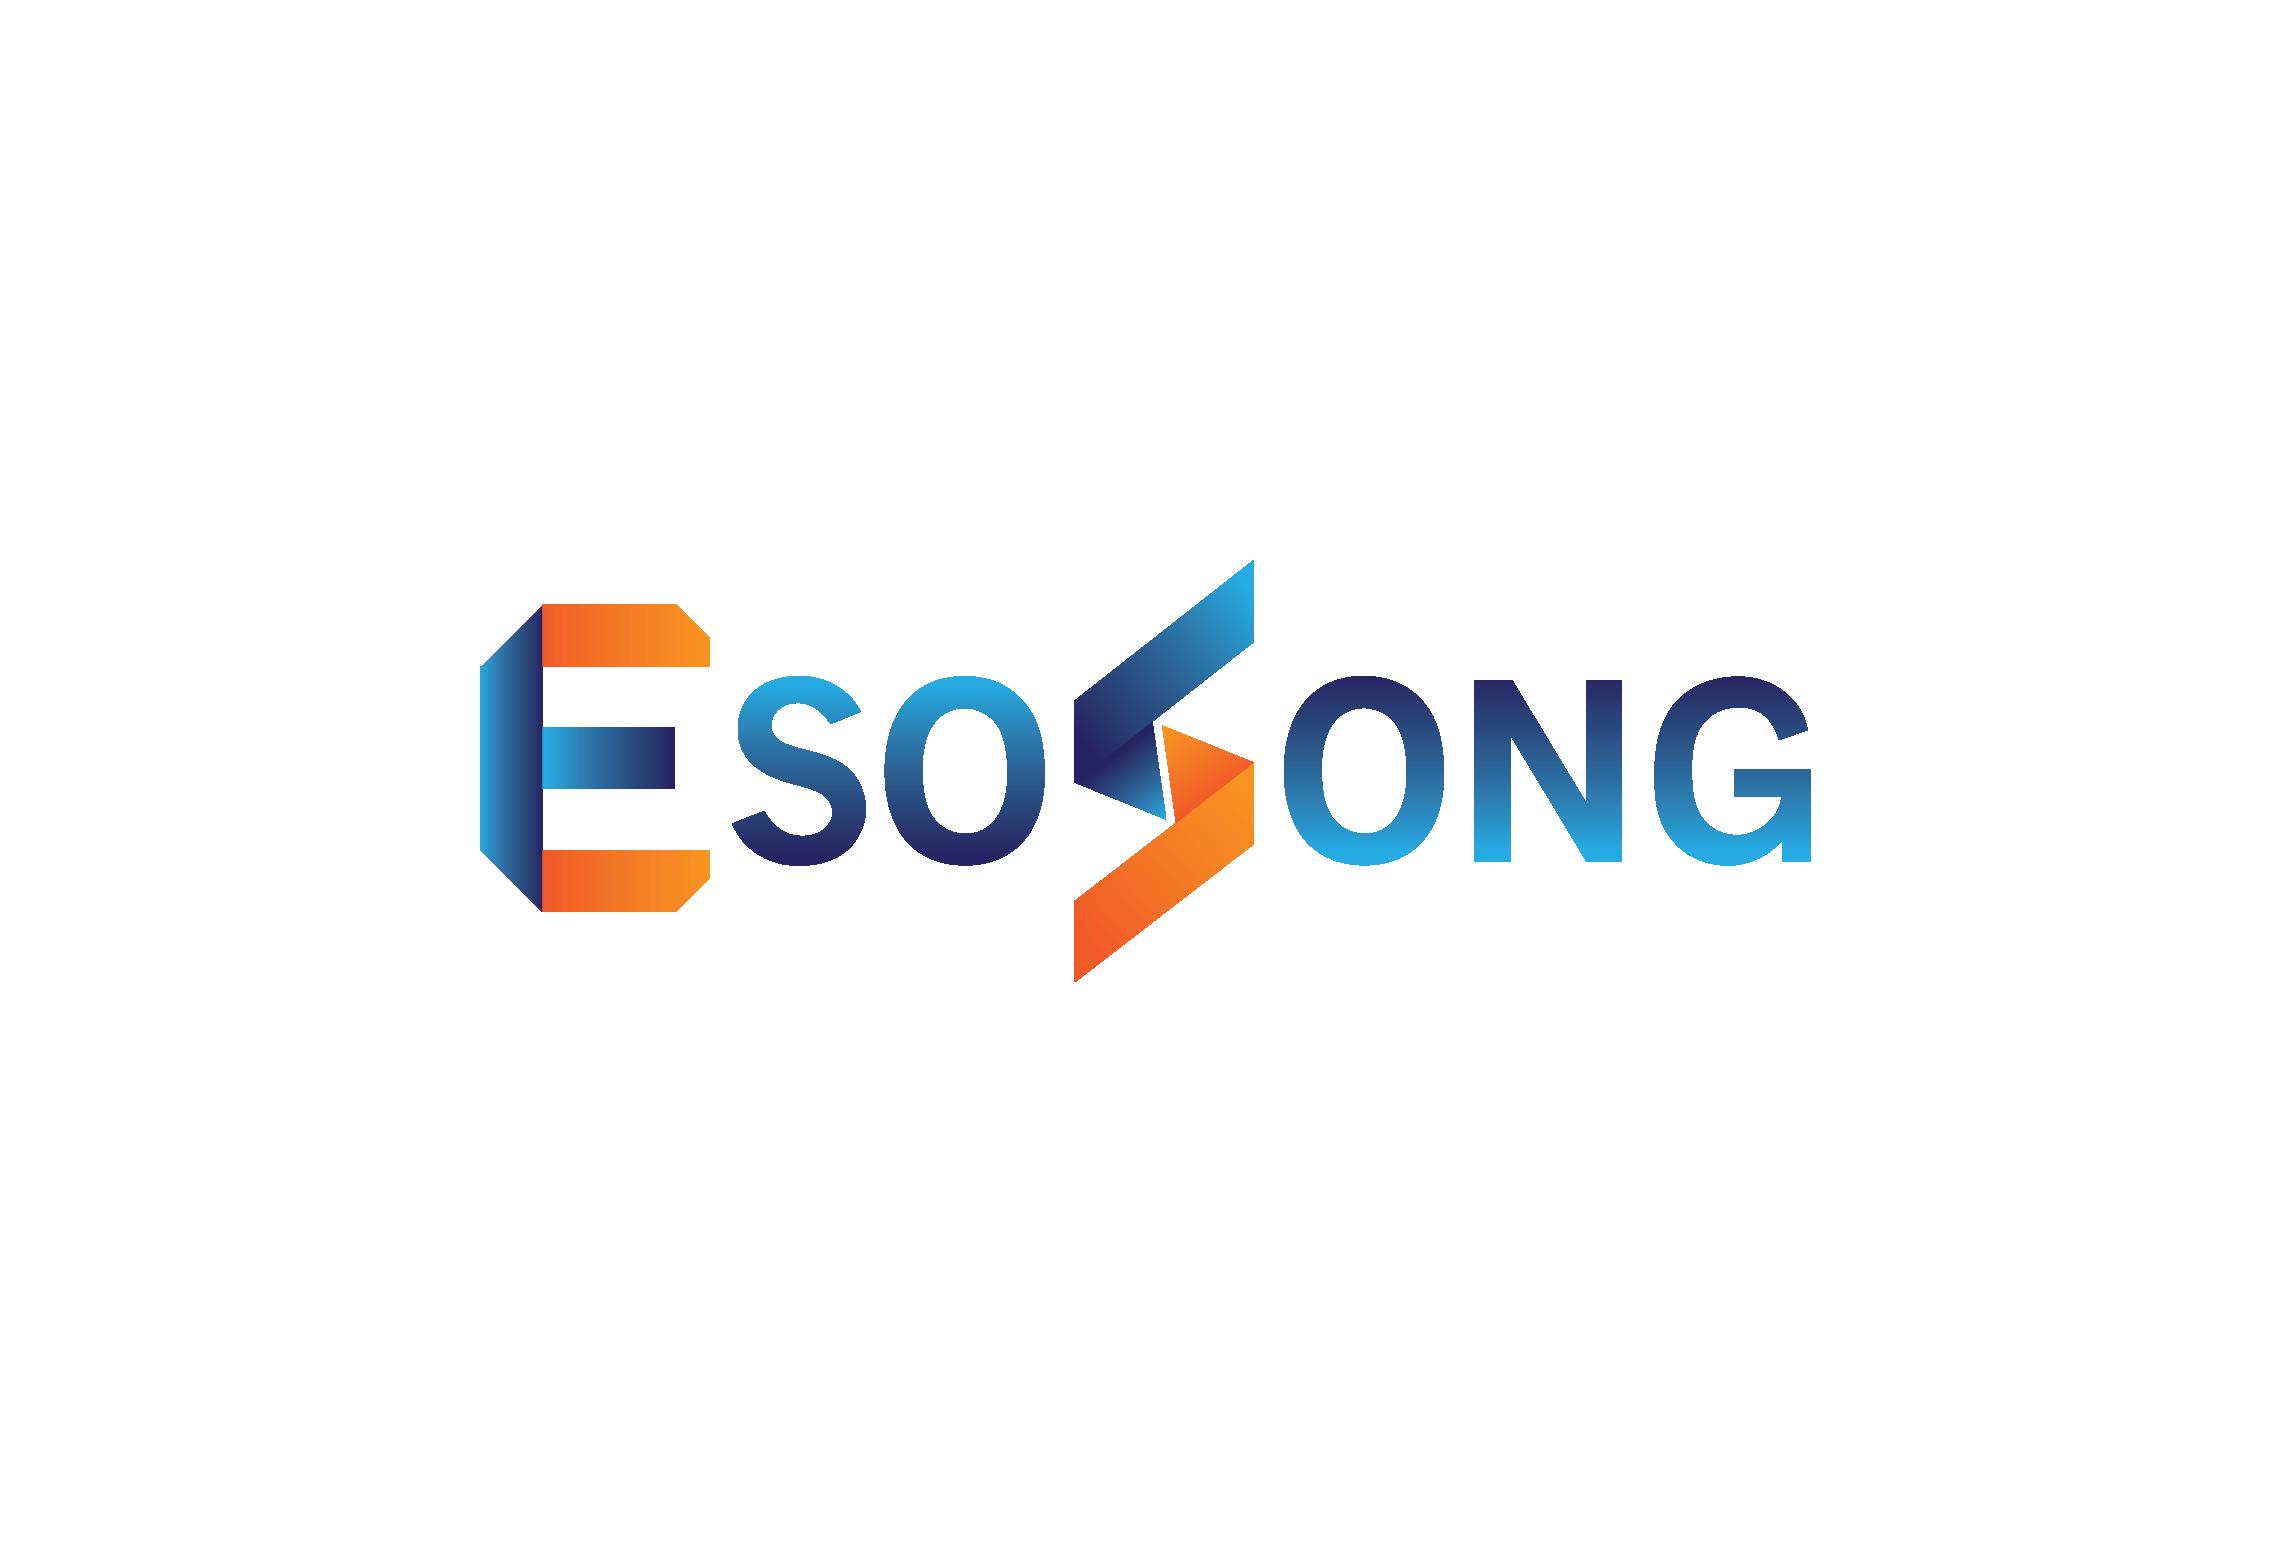 Esosong LLC